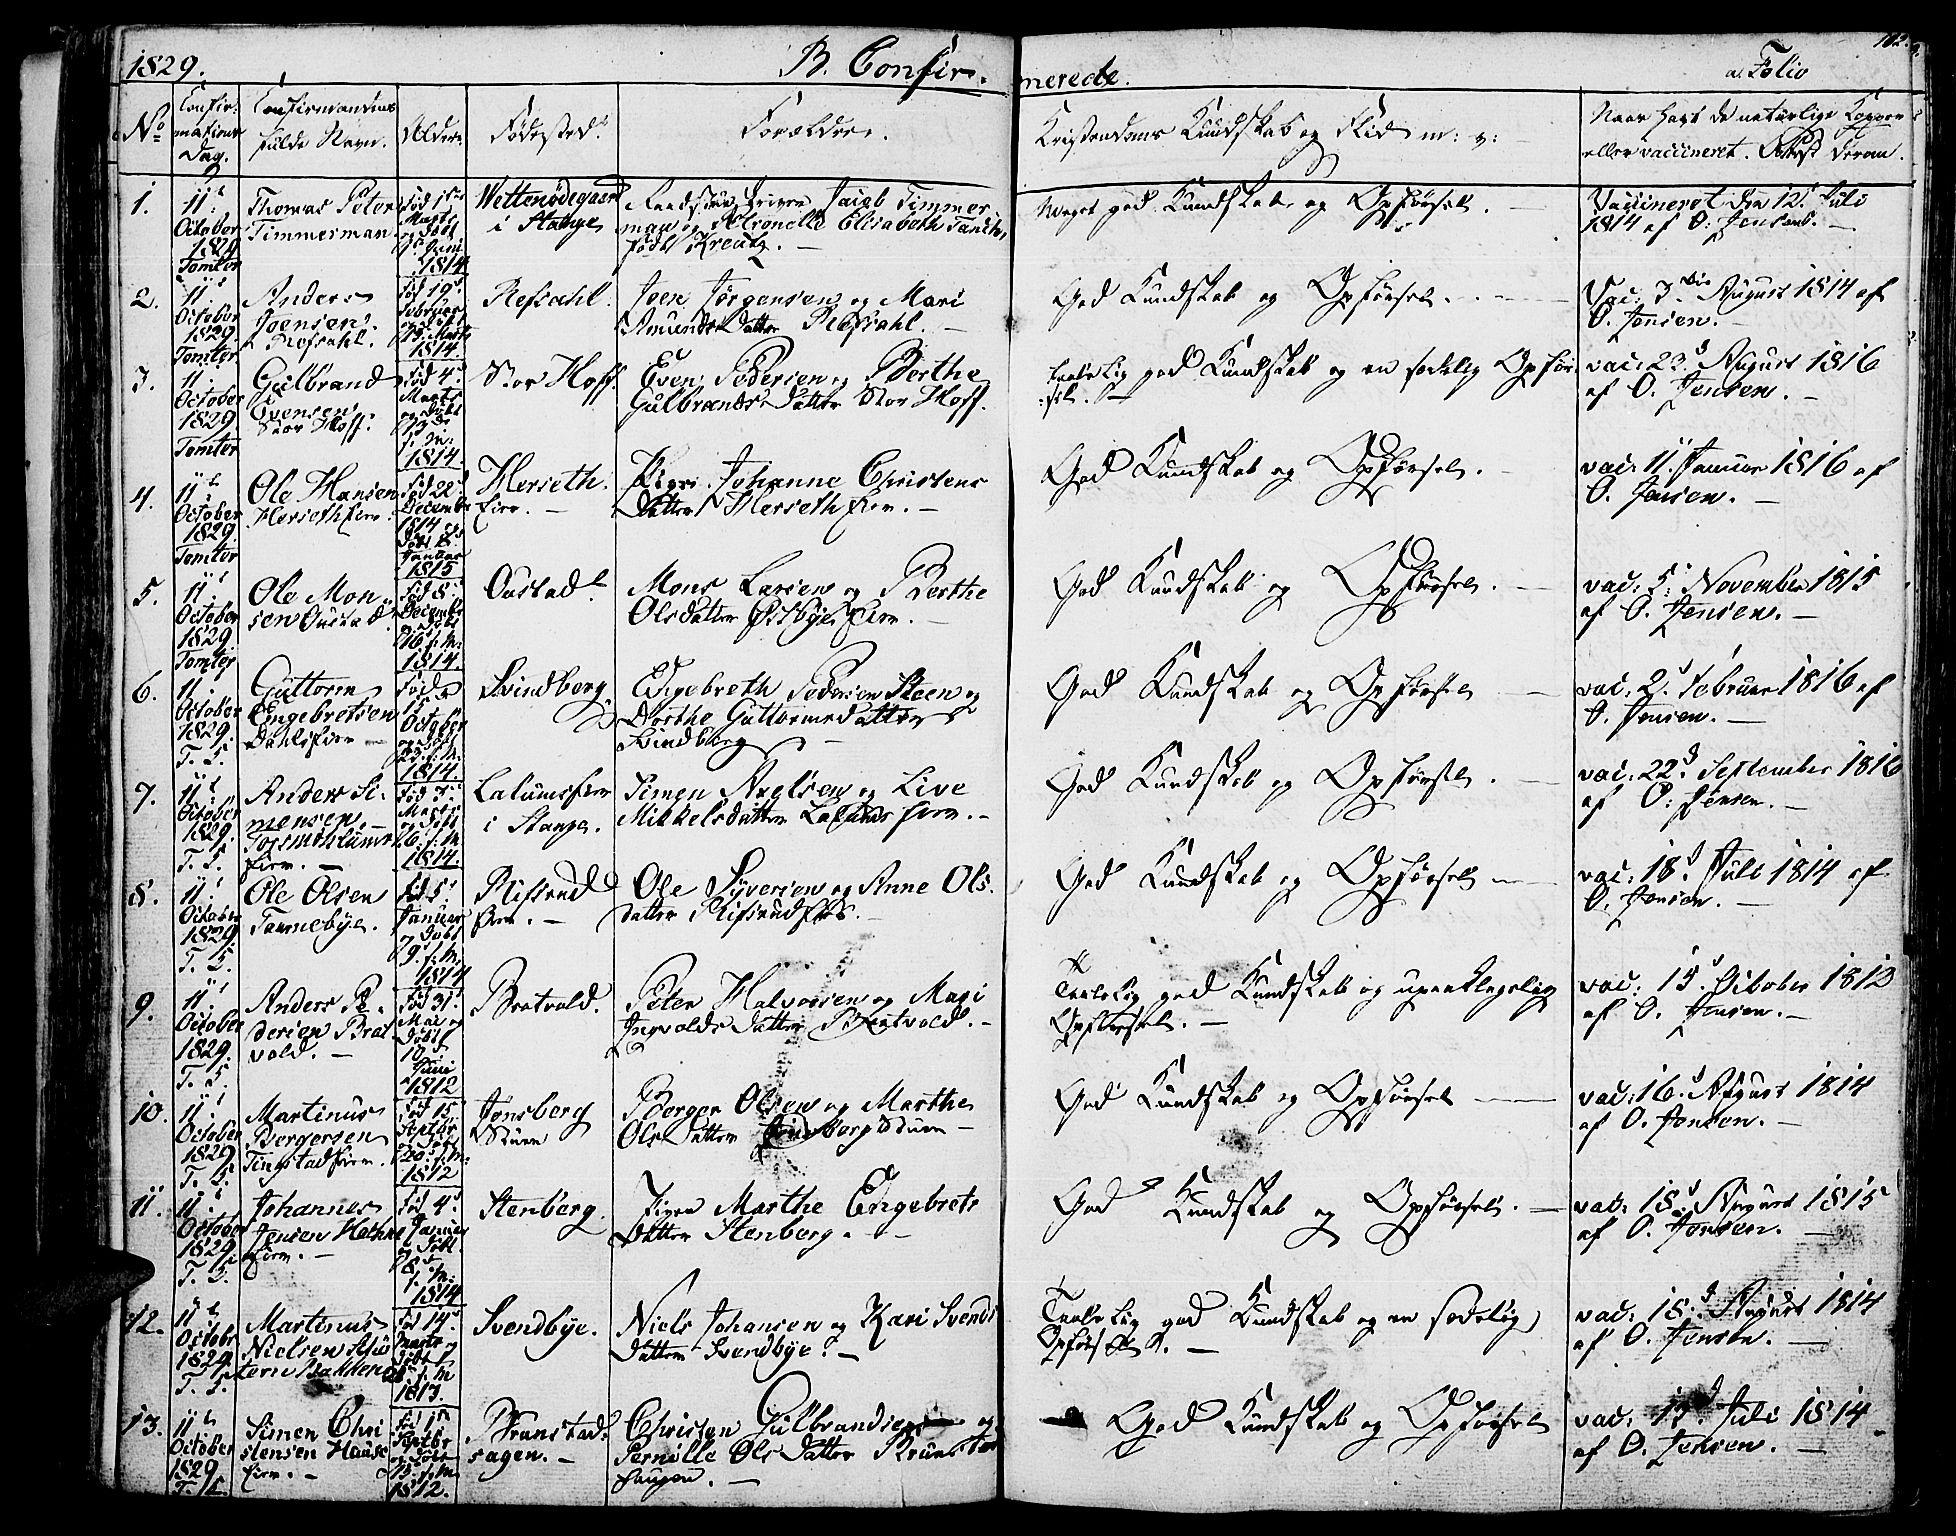 SAH, Romedal prestekontor, K/L0003: Ministerialbok nr. 3, 1829-1846, s. 112